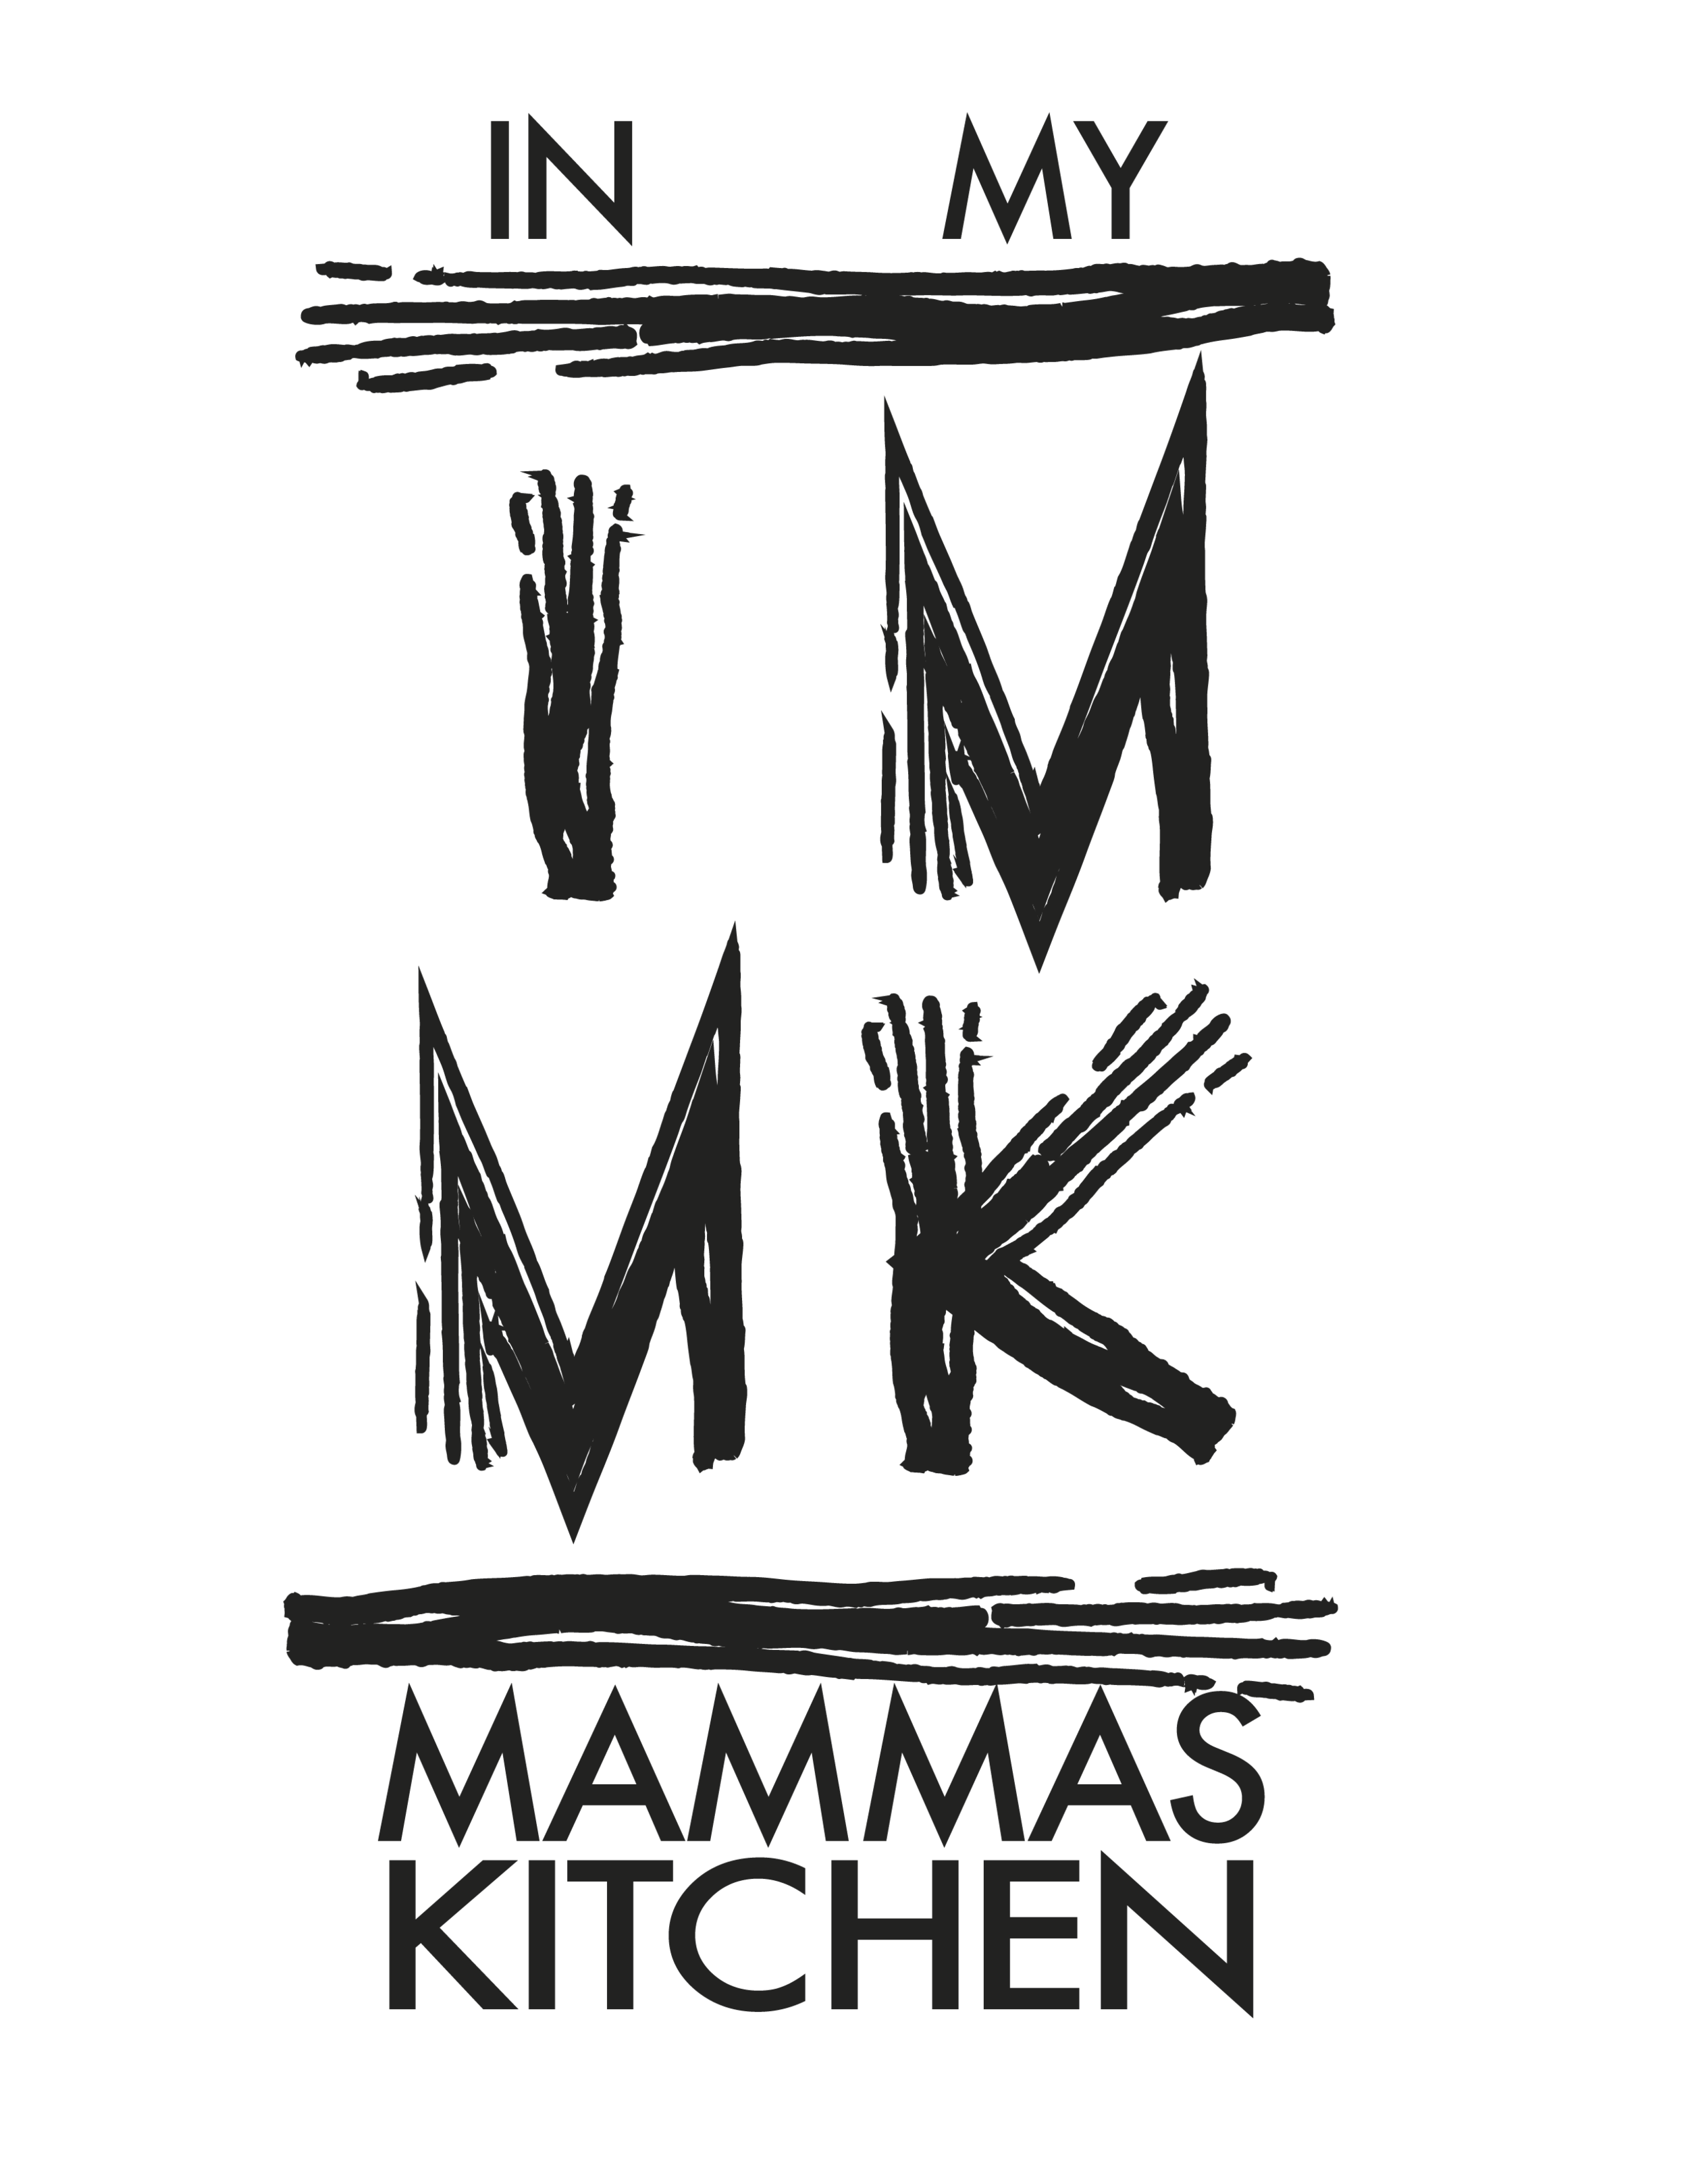 IMMK_Final Logo_white BG-01.png